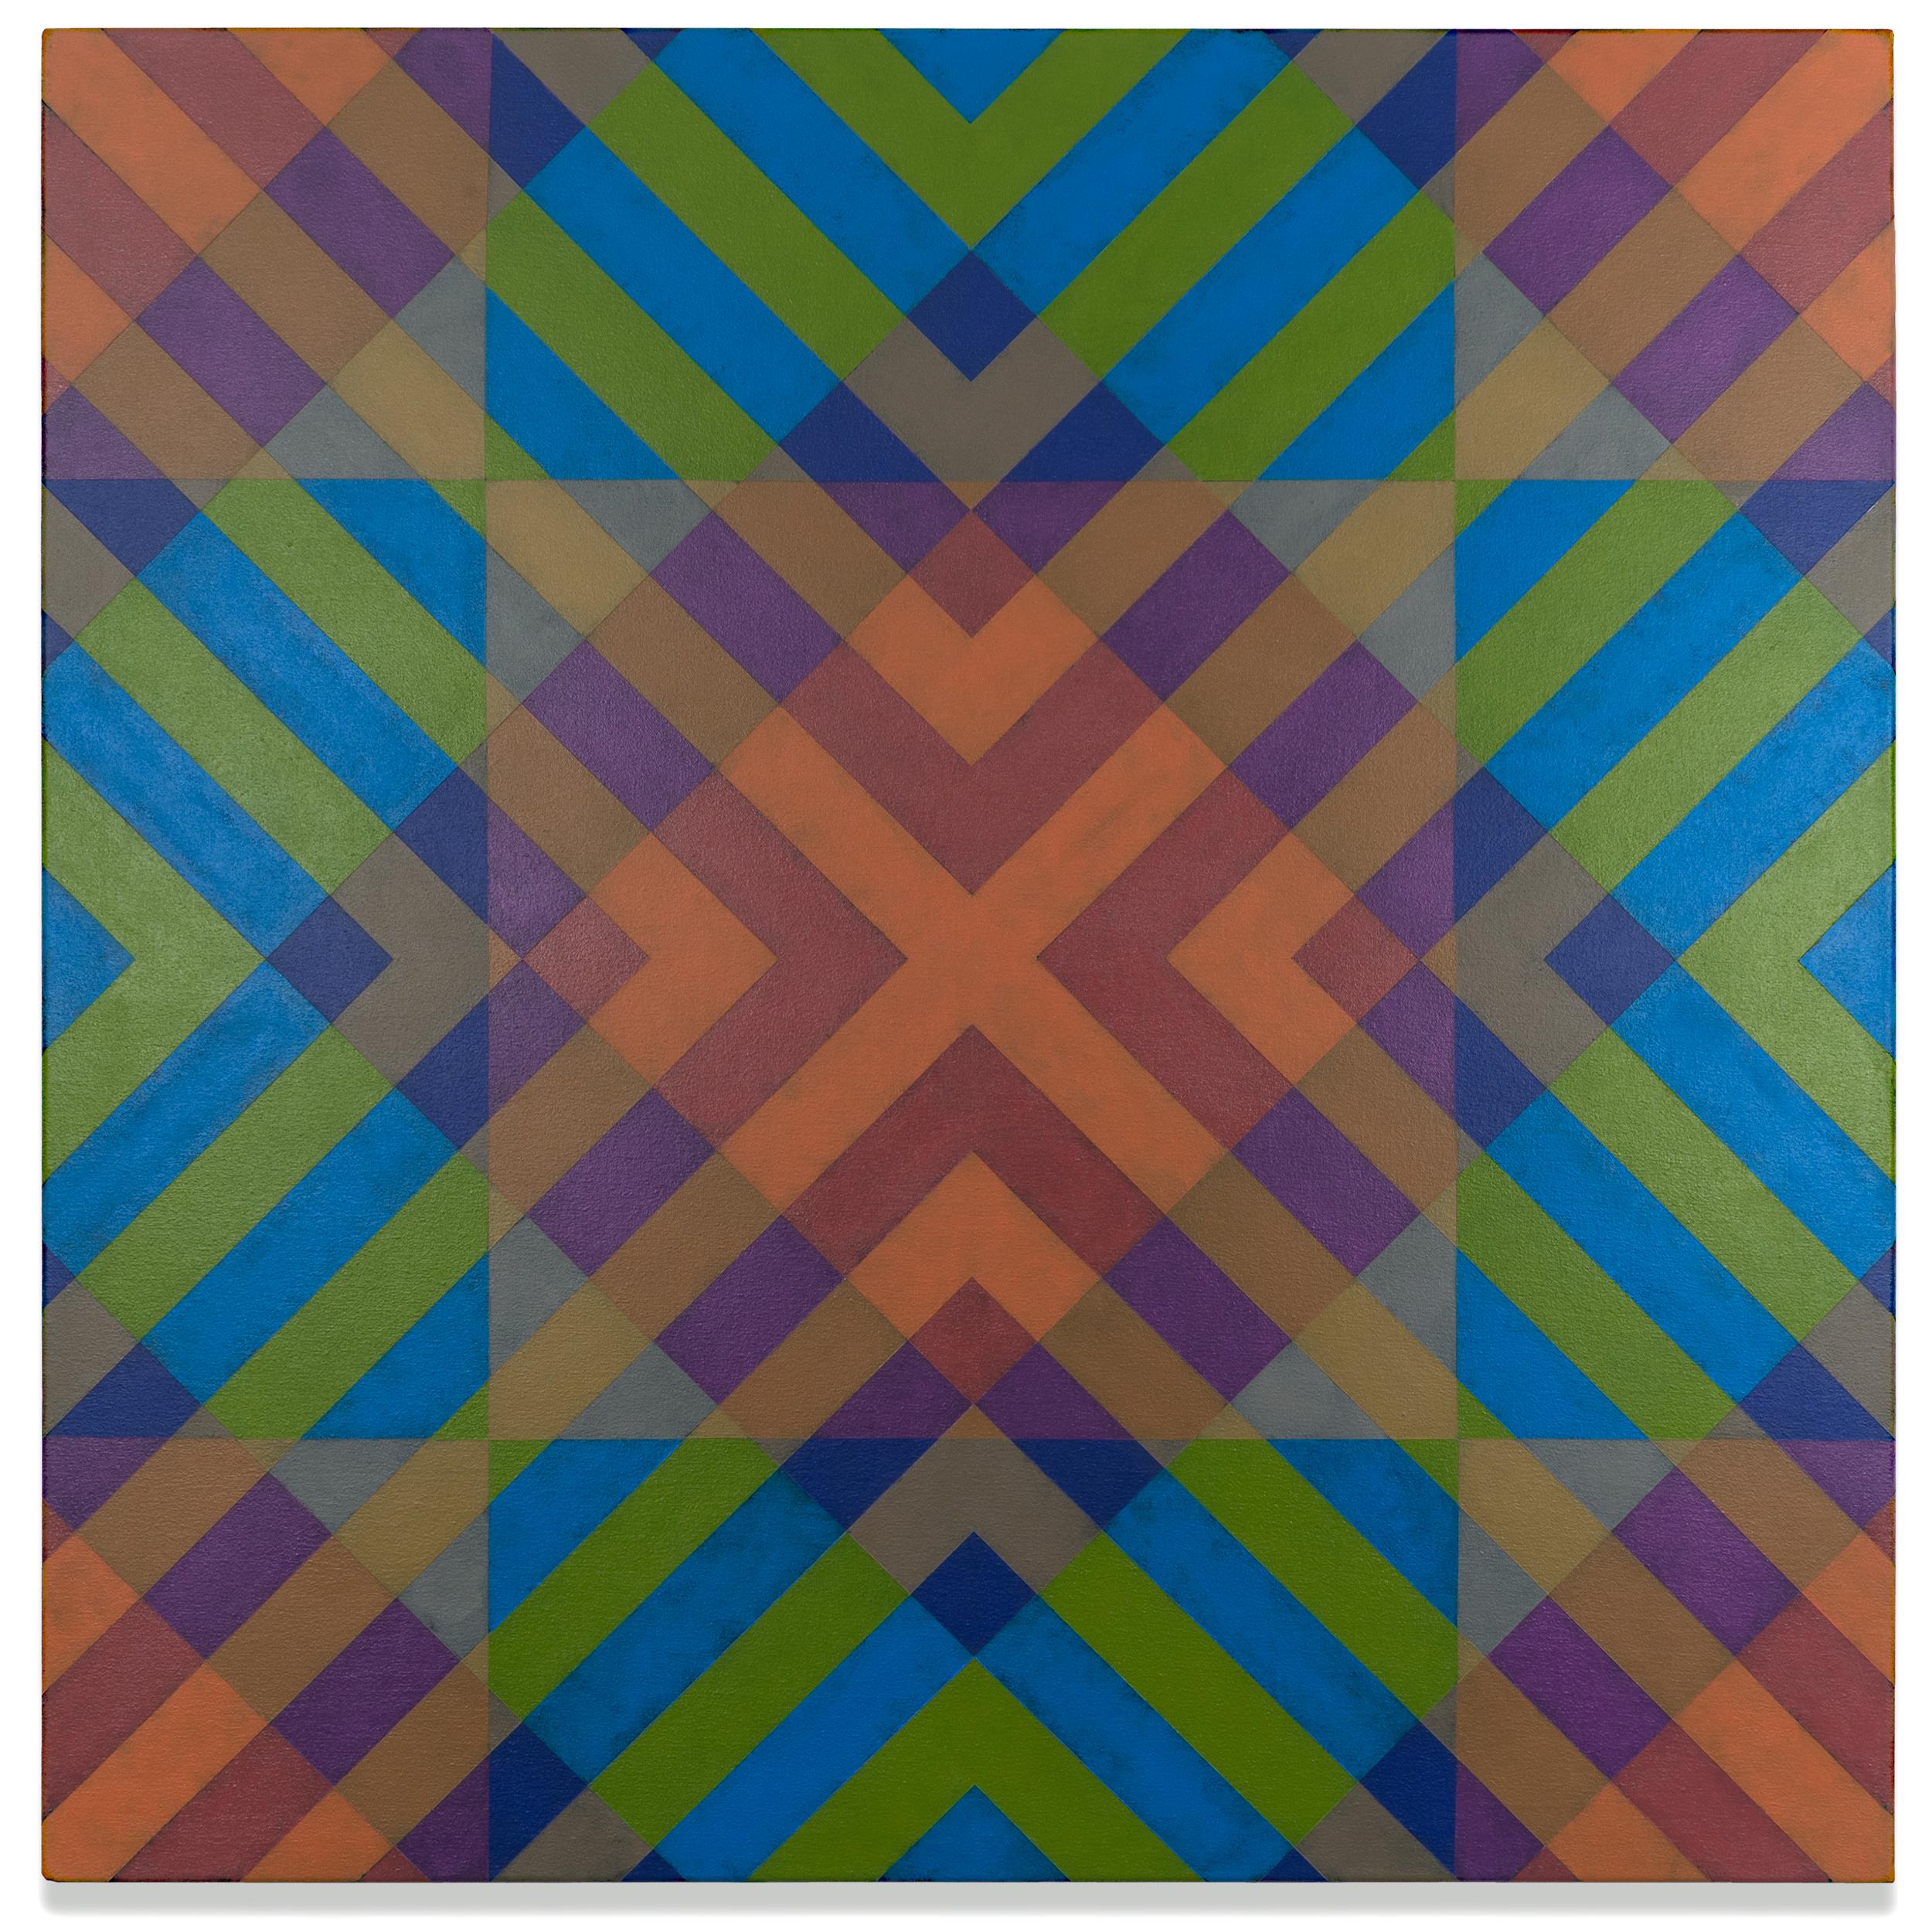 Qualia 462  acrylic on canvas 36 x 36 inches 2017